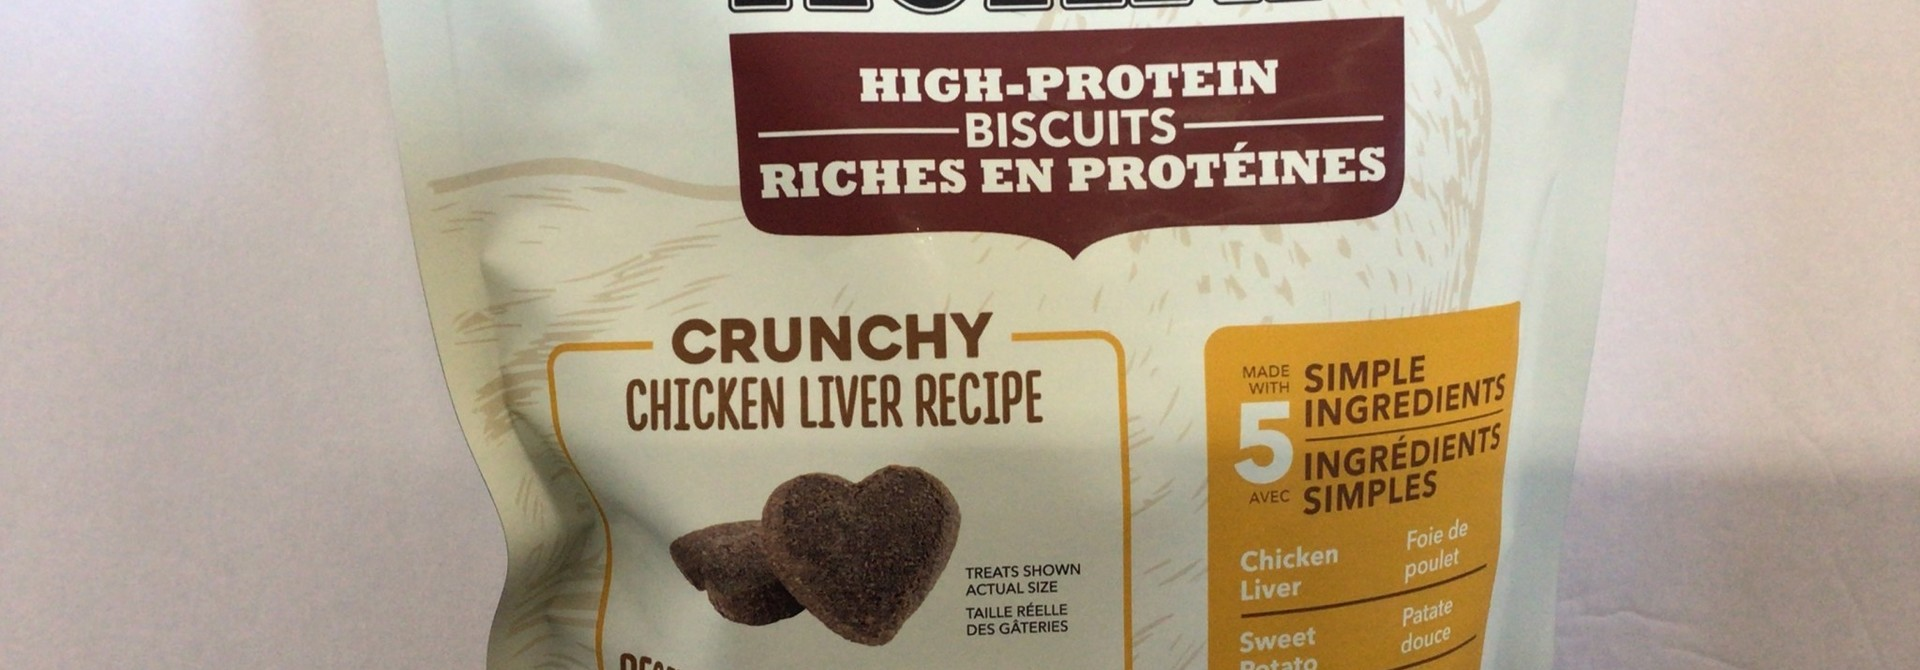 Crunchy Chicken Liver Treat-Small-255gm